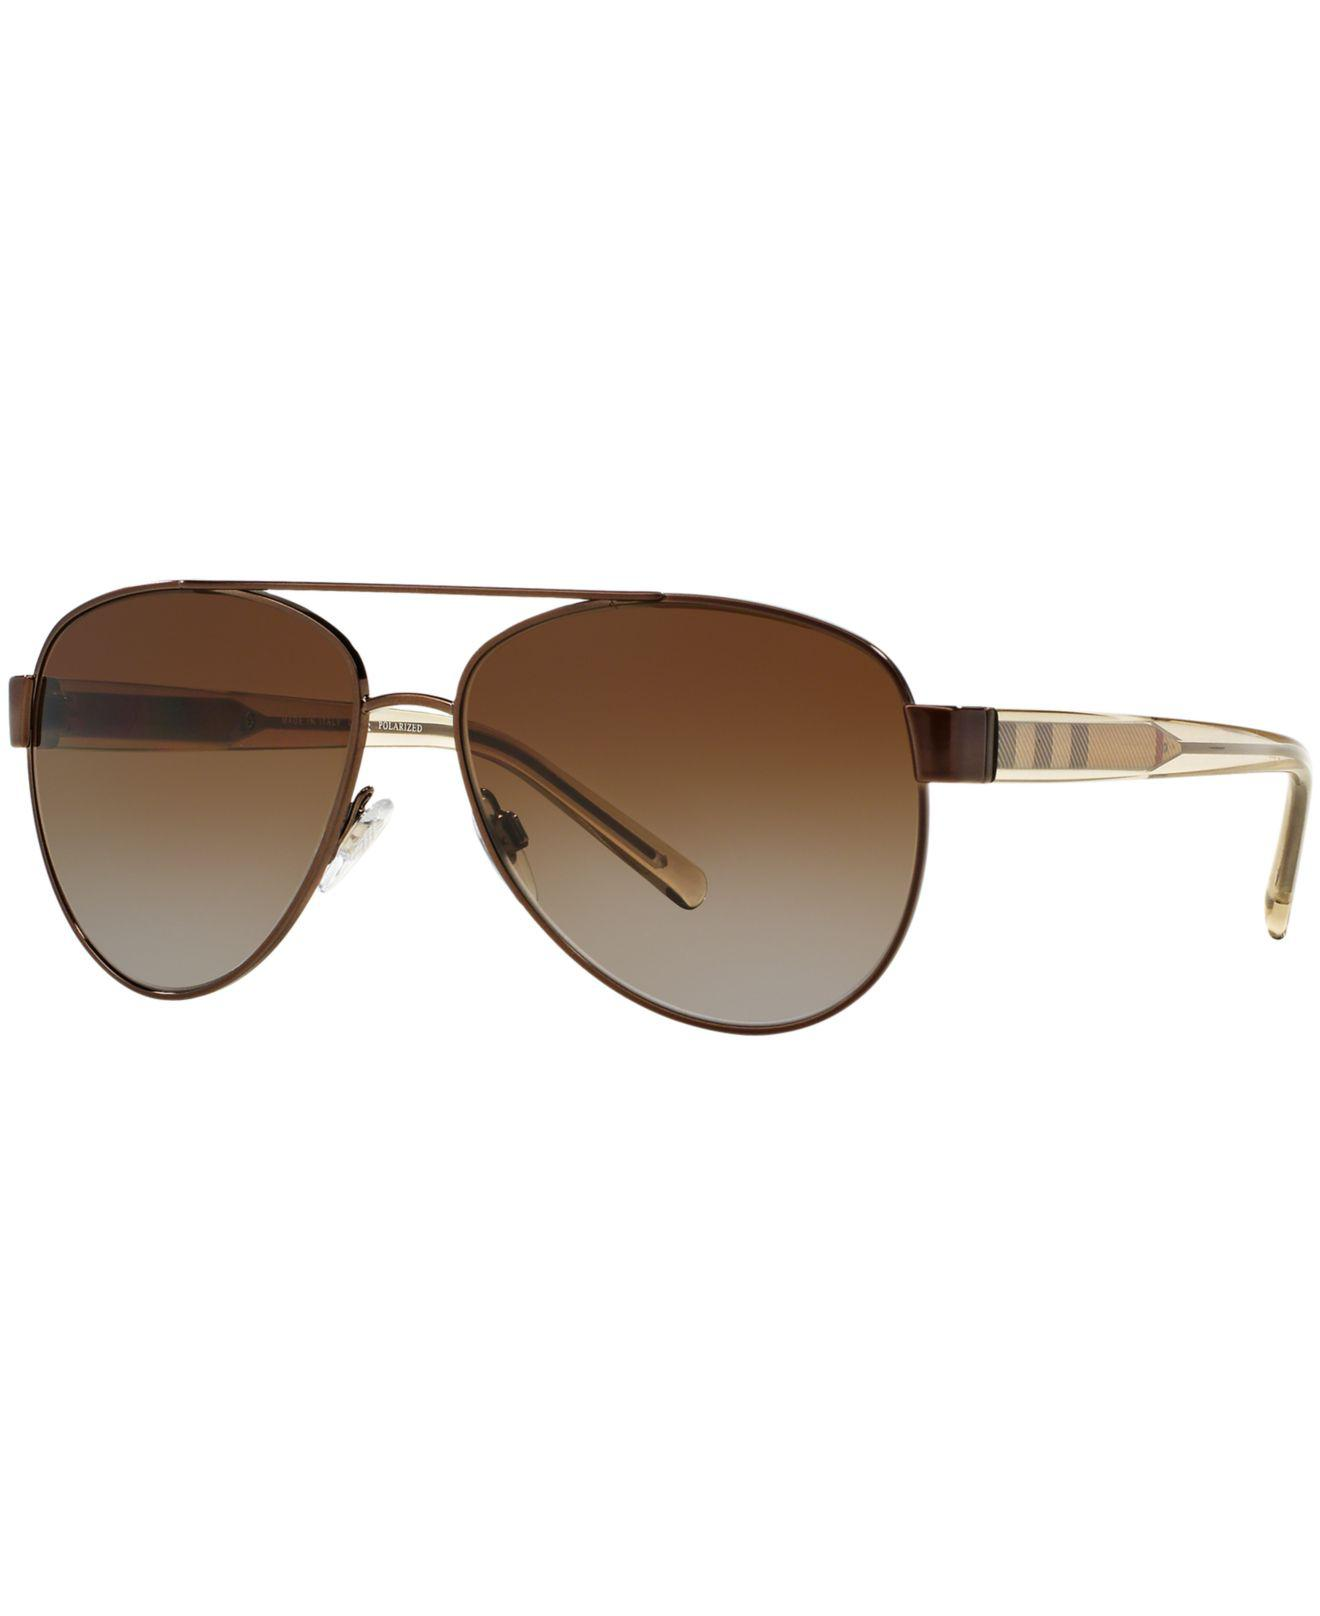 80bed5372c Burberry. Women s Brown Sunglasses ...